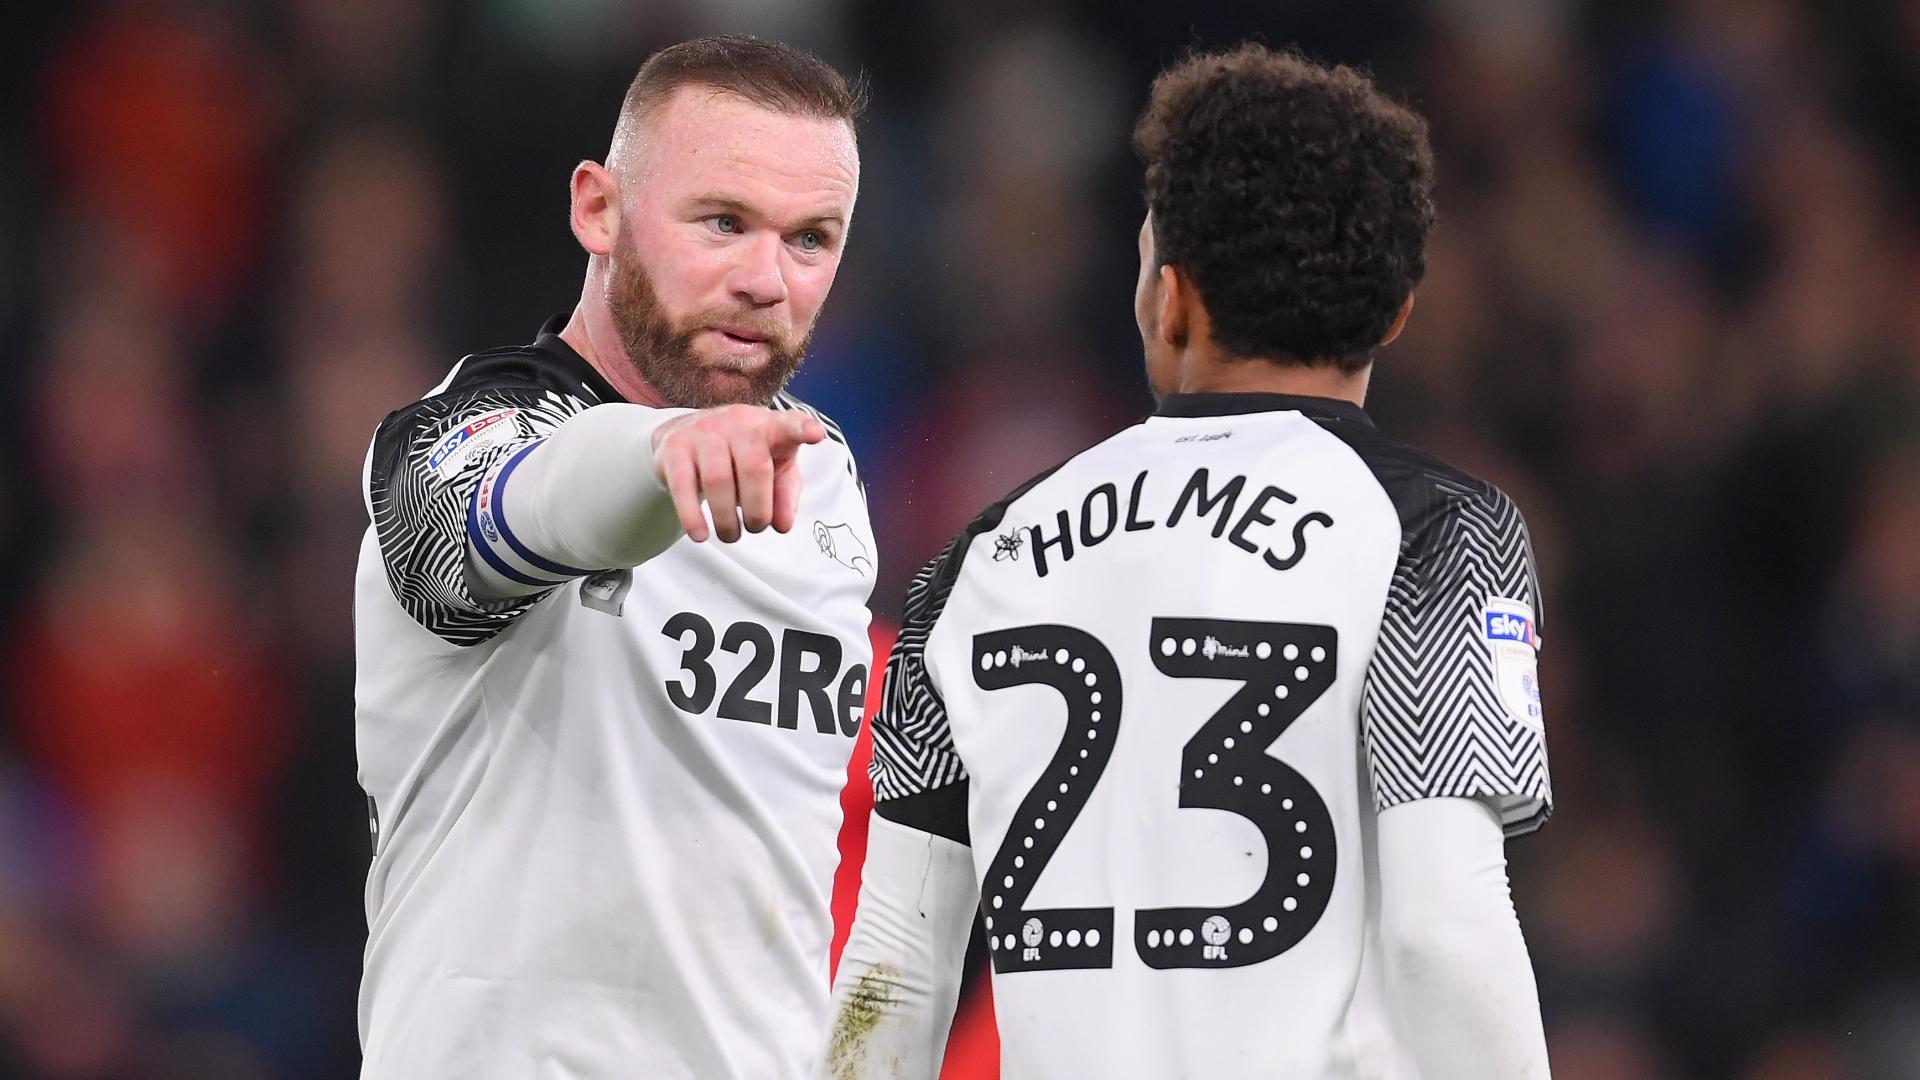 Wayne Rooney Duane Holmes Derby County 2019-20